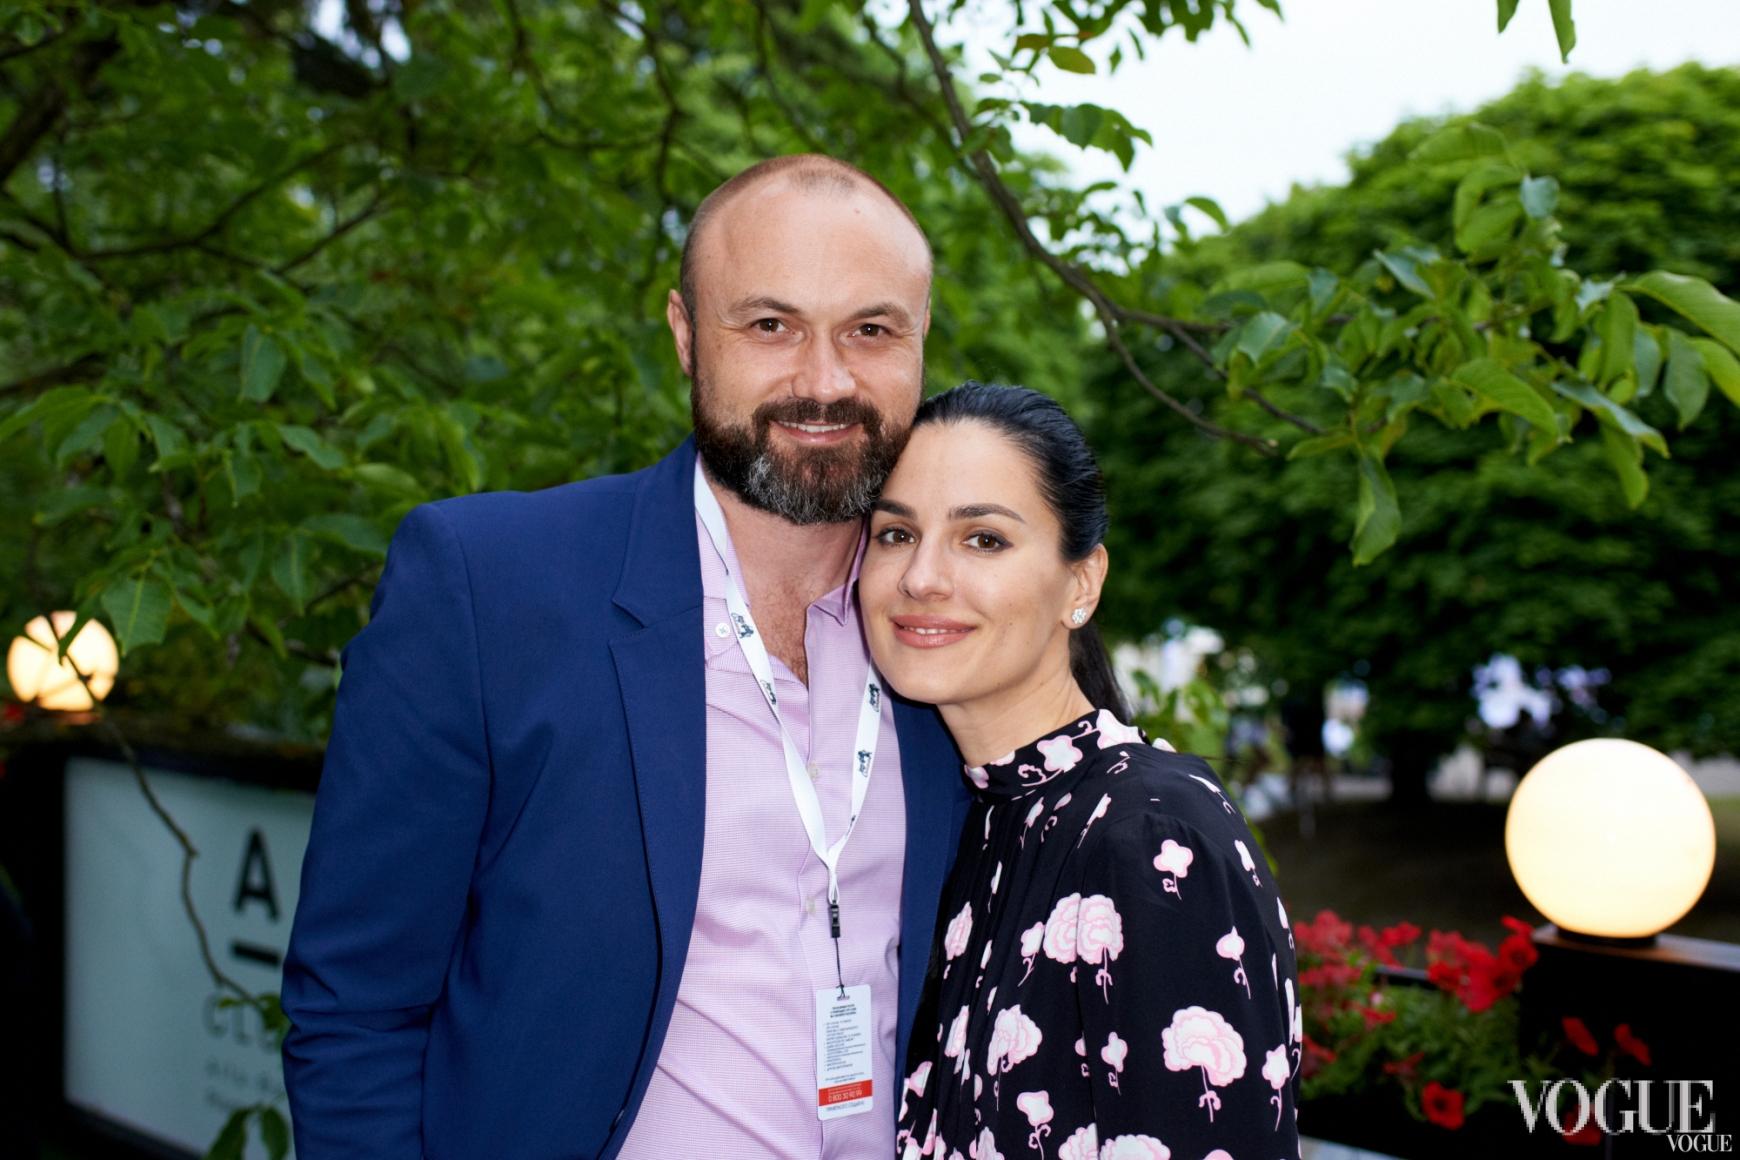 Тимур Хромаев и Маша Ефросинина